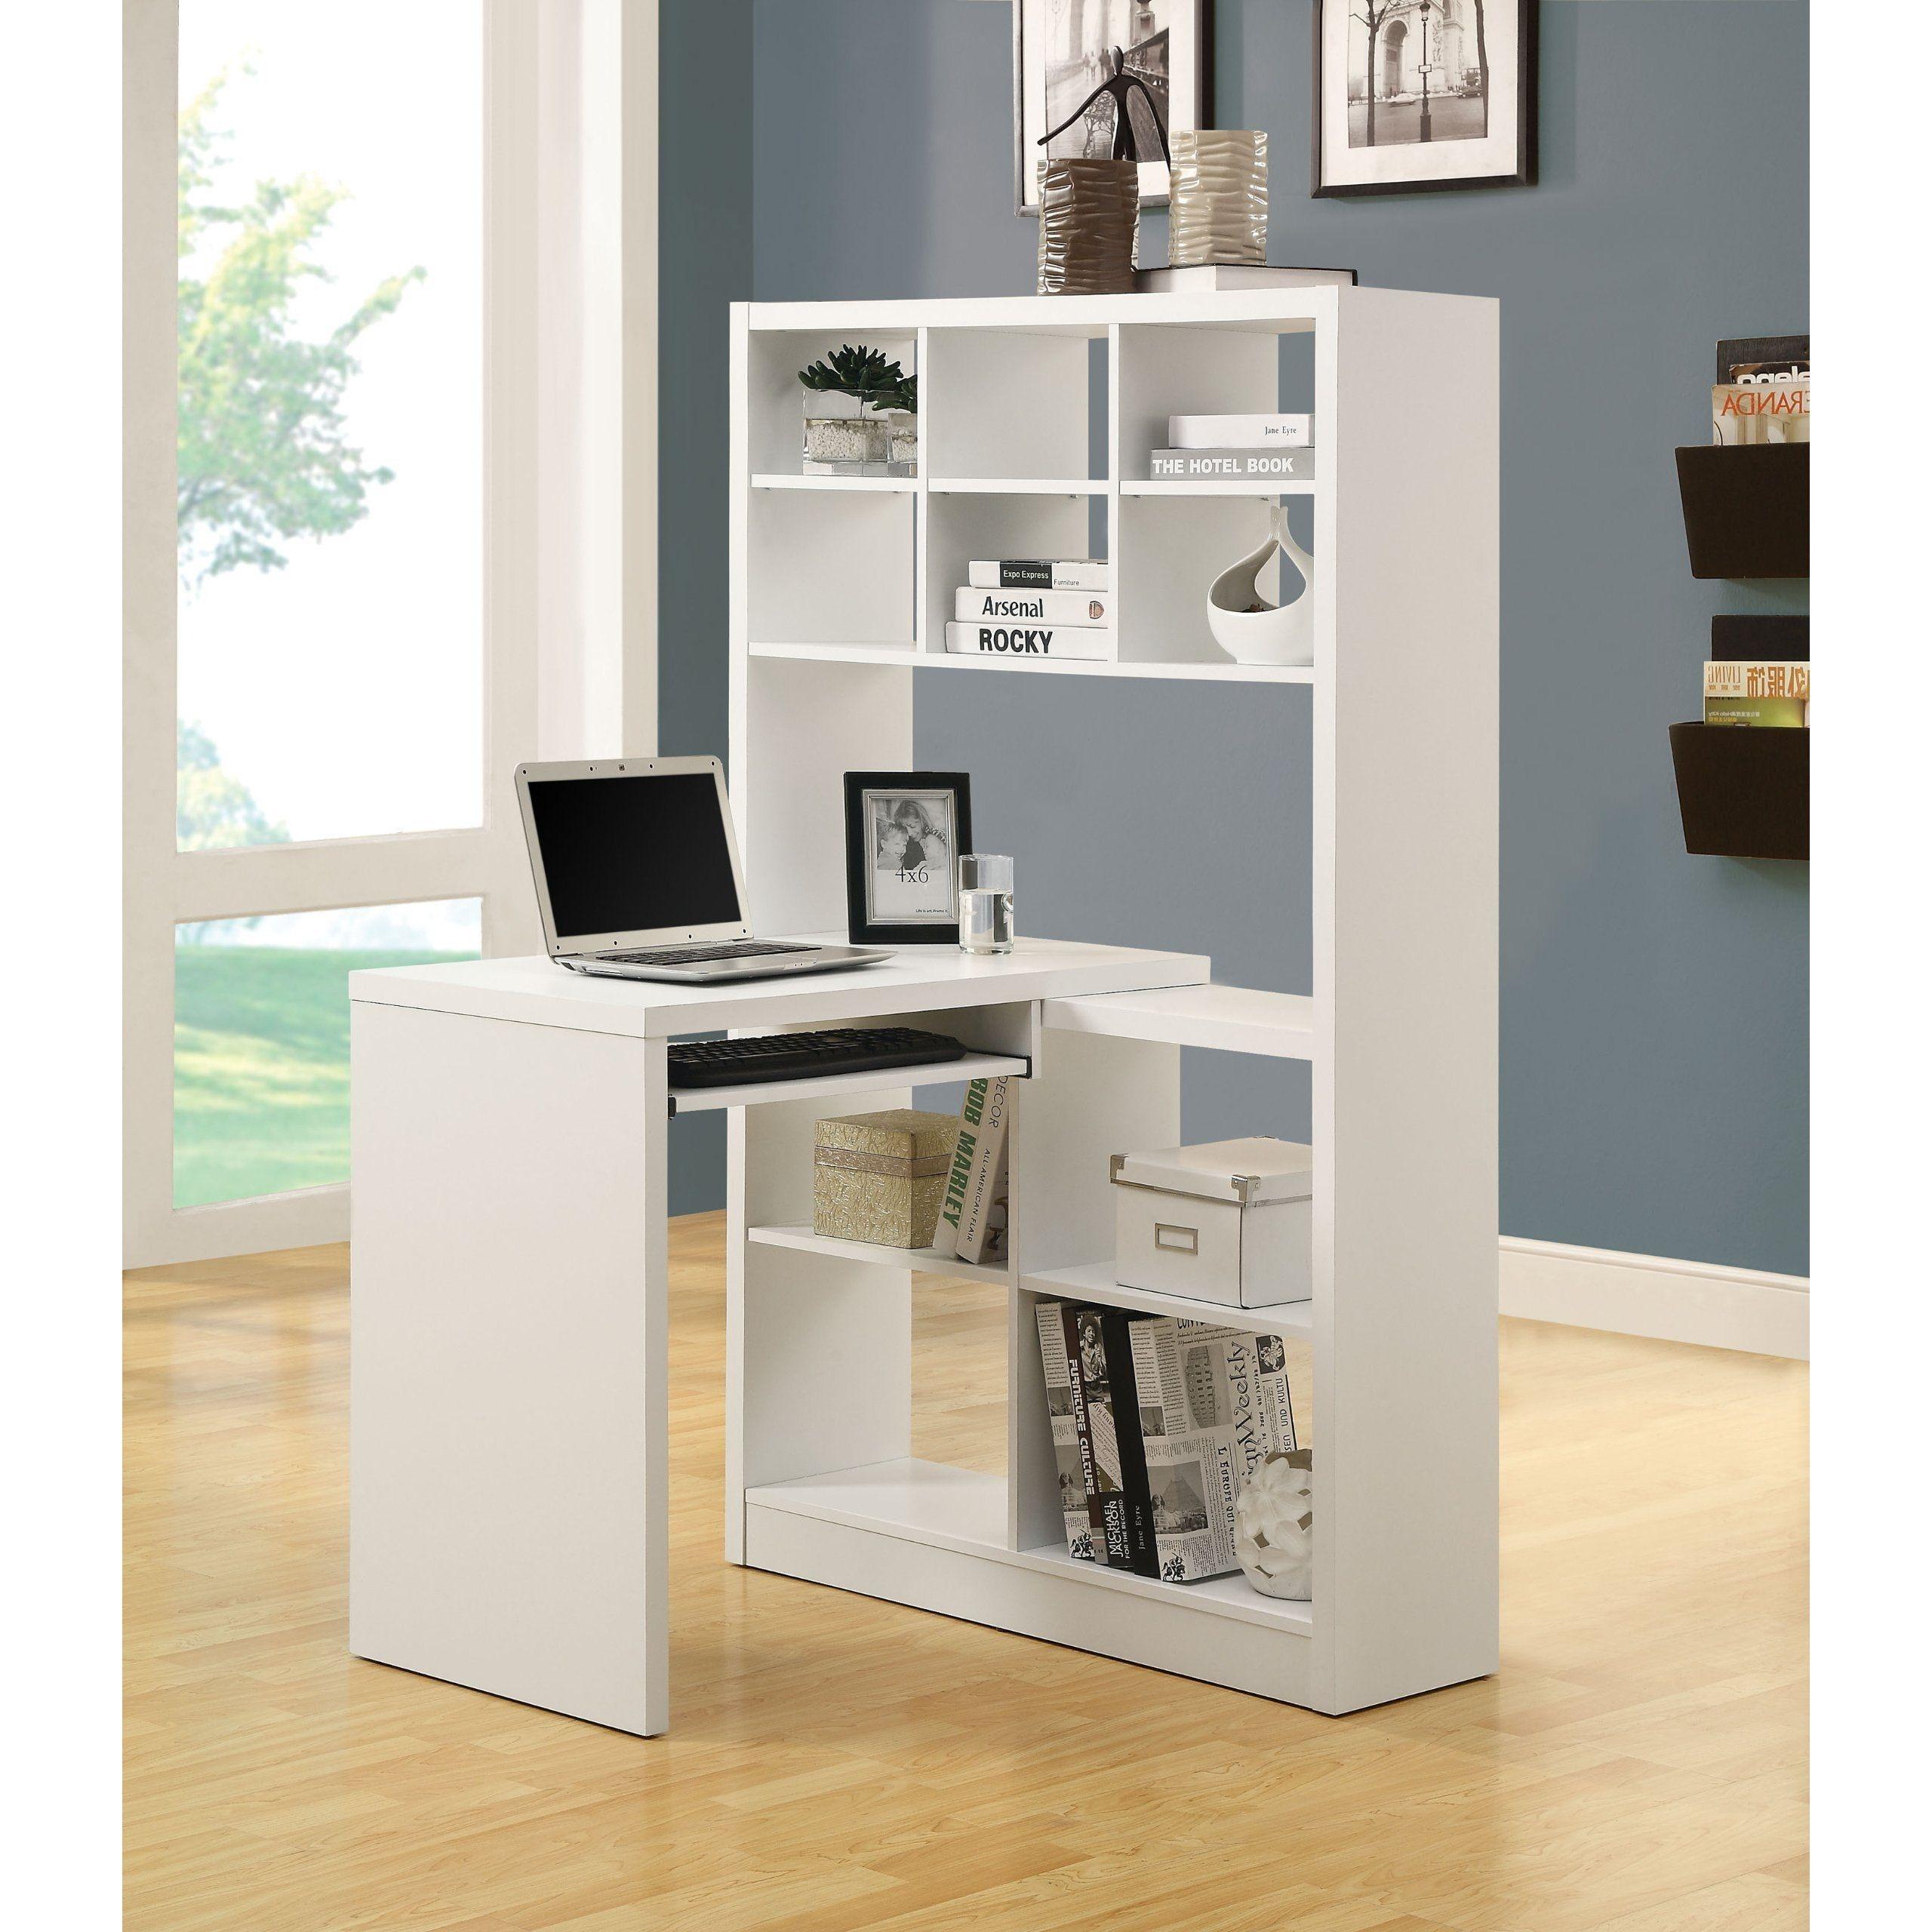 Delicieux White Corner Desk With Shelves   Ideas On Foter